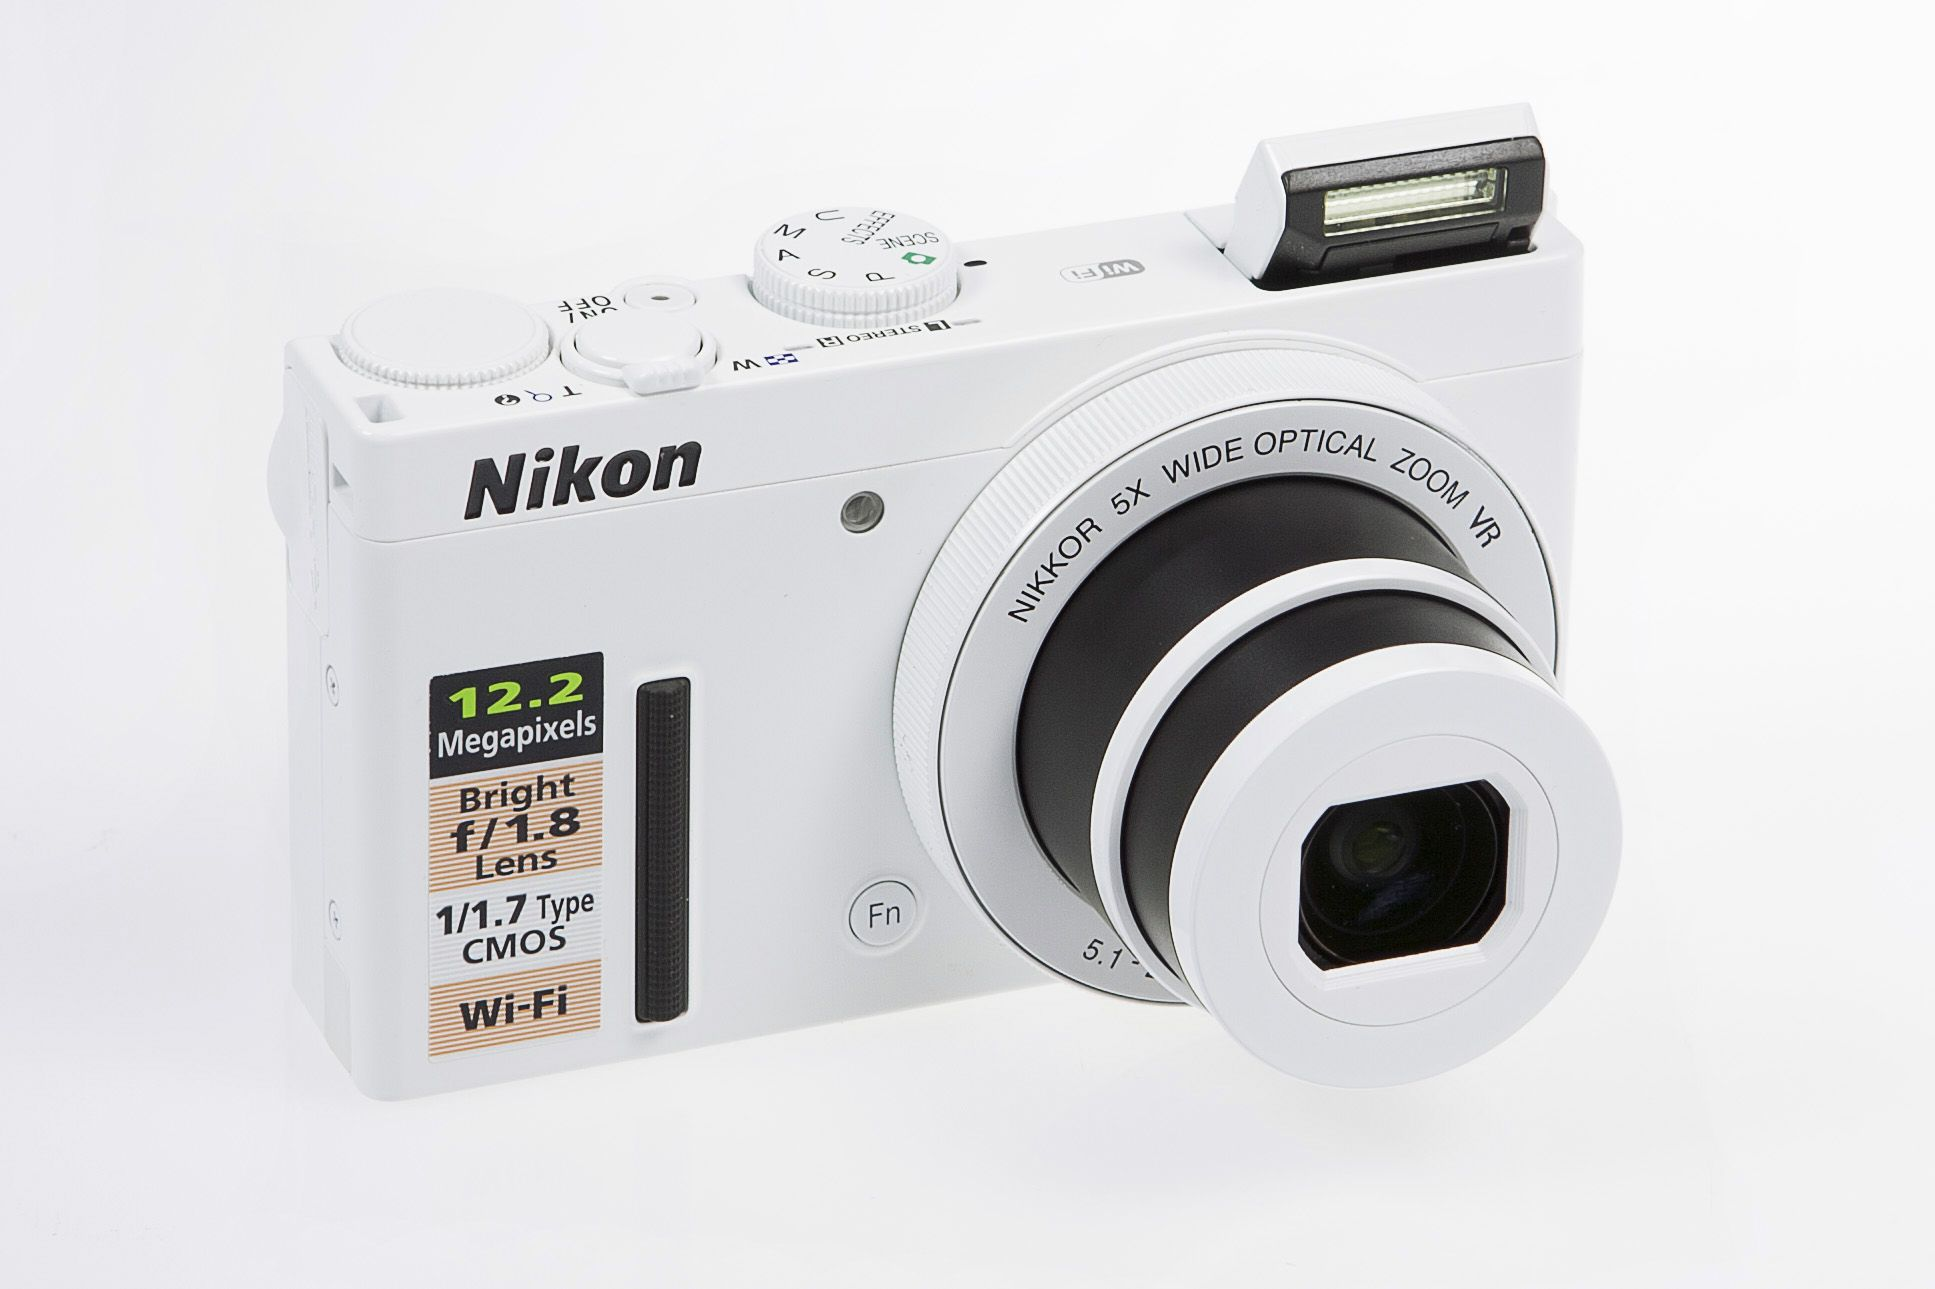 NikonP340 652copie1